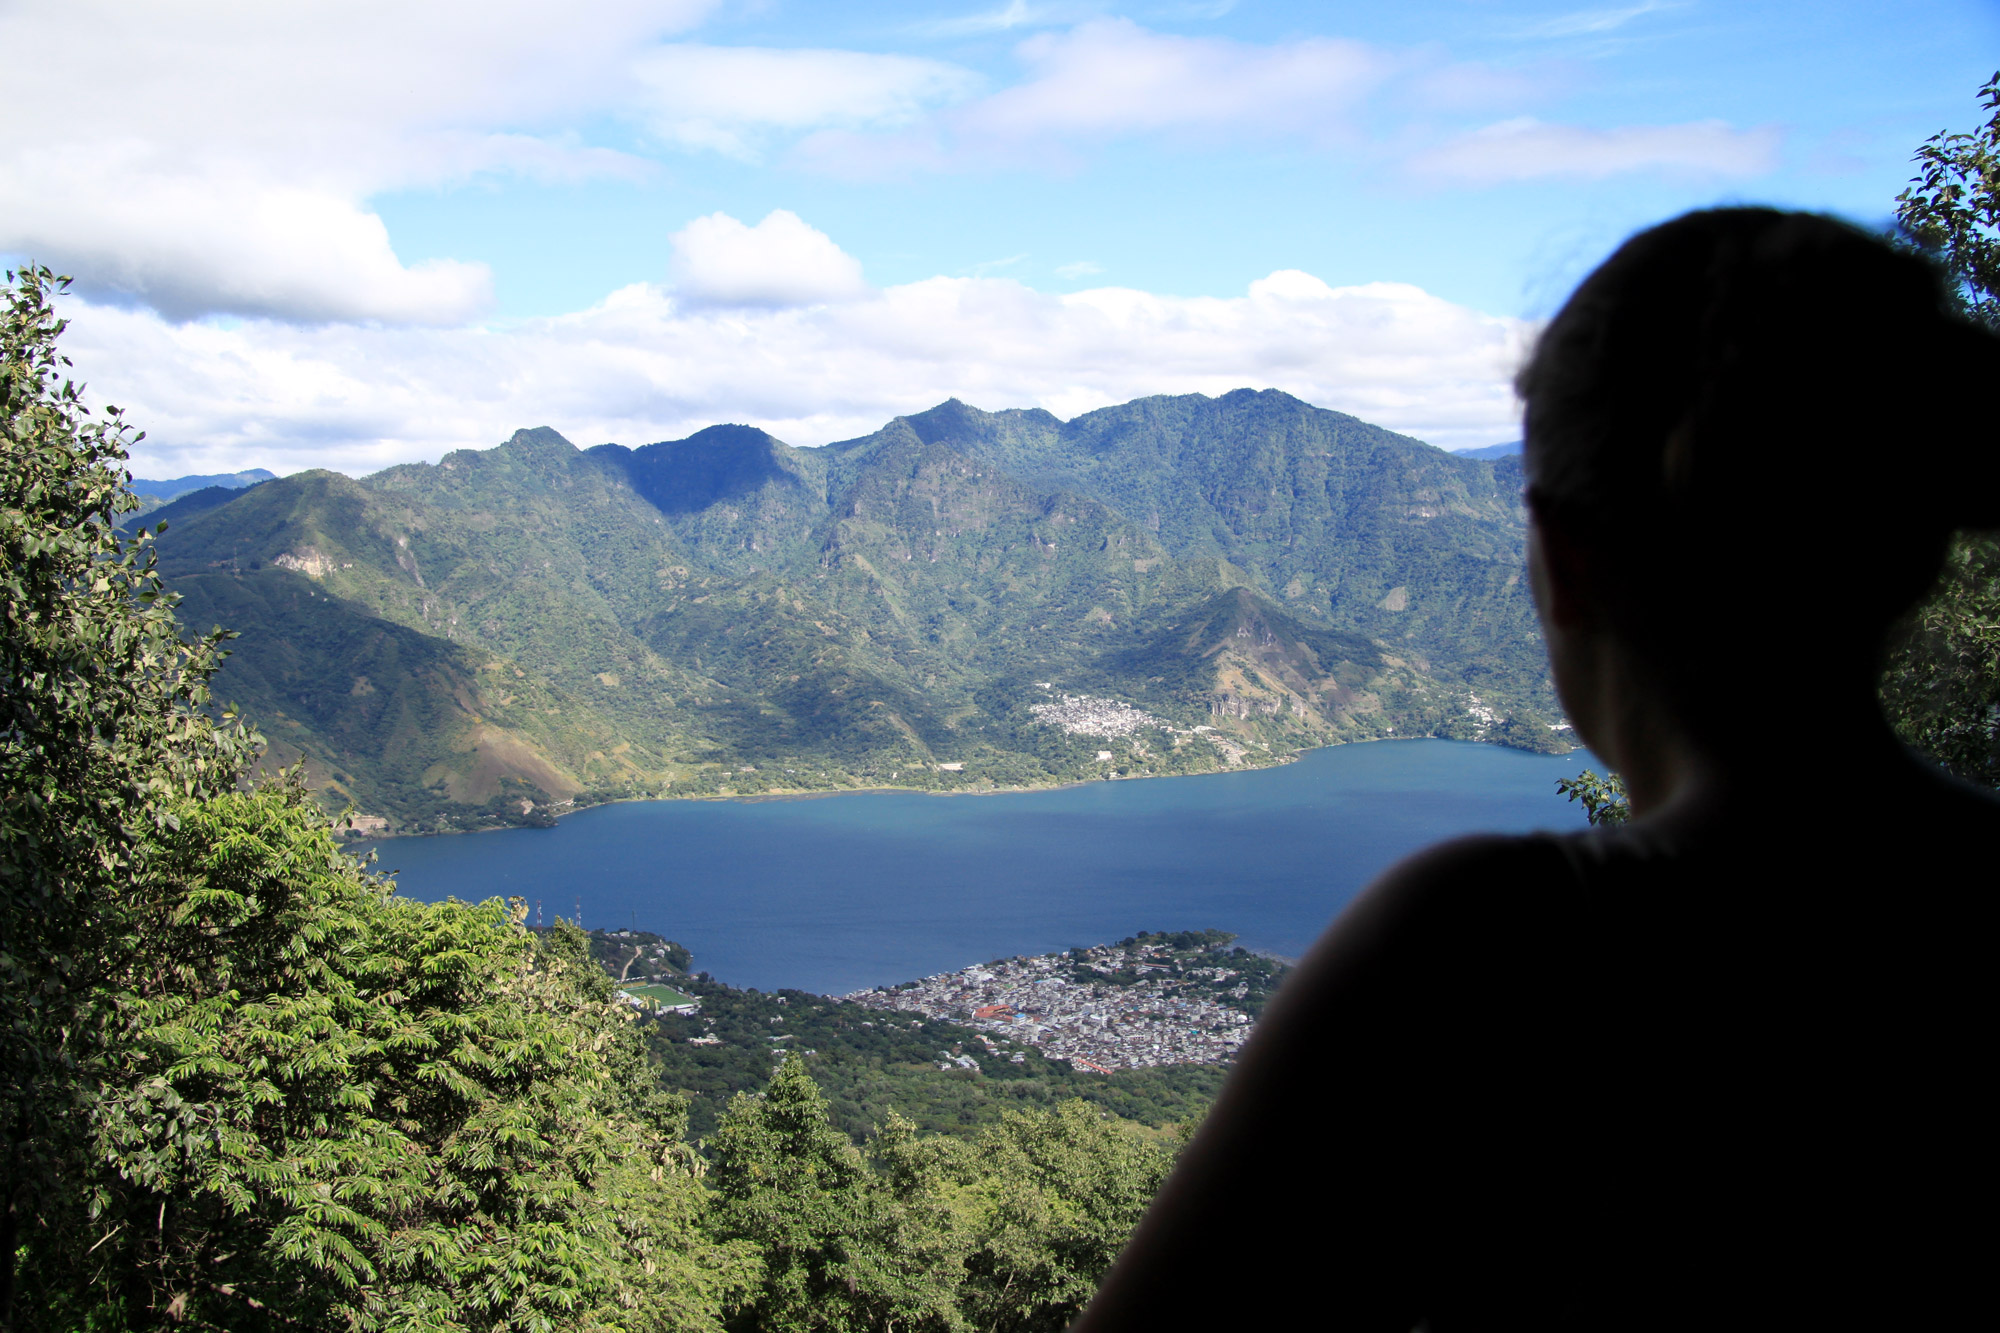 Guatemala 2015 - dag 18 - Een blik op San Pedro la Laguna